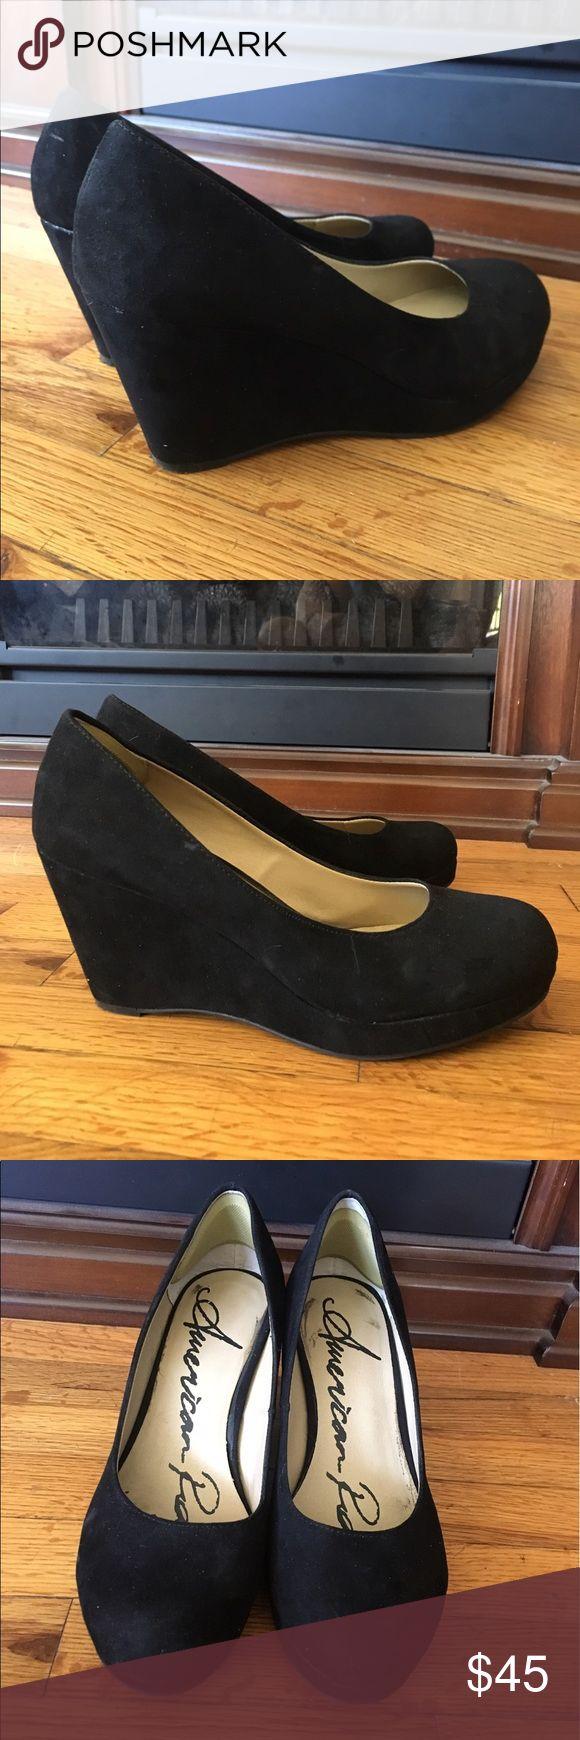 "Kenna Platform Wedge Pumps Round, closed-toe slip-on platform wedge pumps. Microsuede upper, manmade sole. 3"" wedge heel, 1"" platform. Worn three times. American Rag Shoes Wedges"